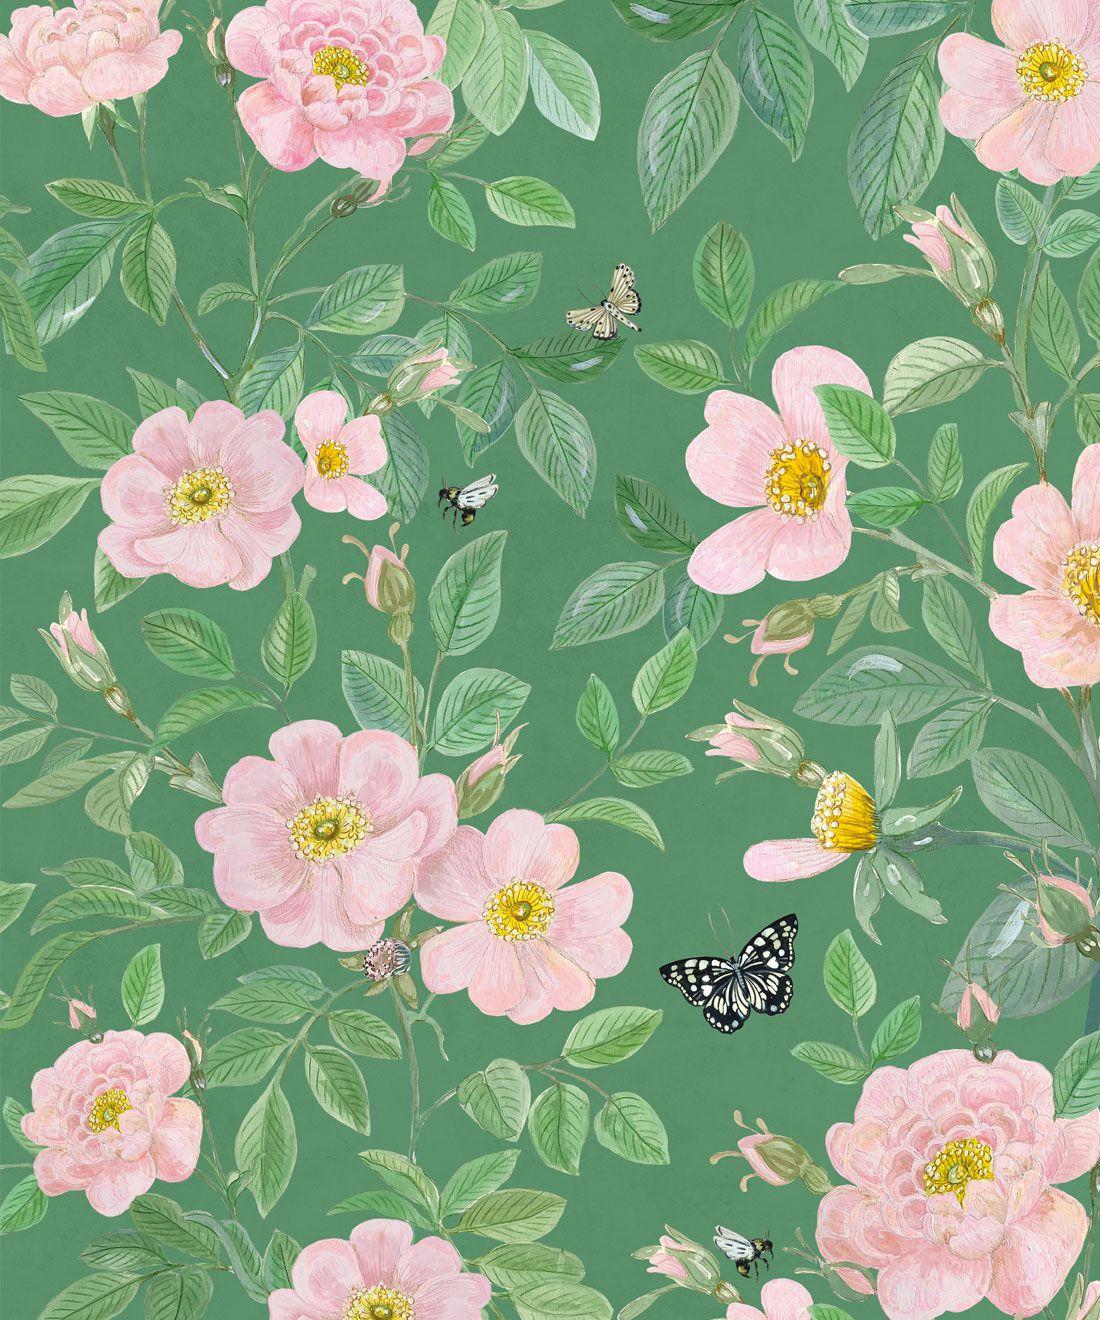 Rosa Wallpaper • Floral Wallpaper •Forest Green •Swatch